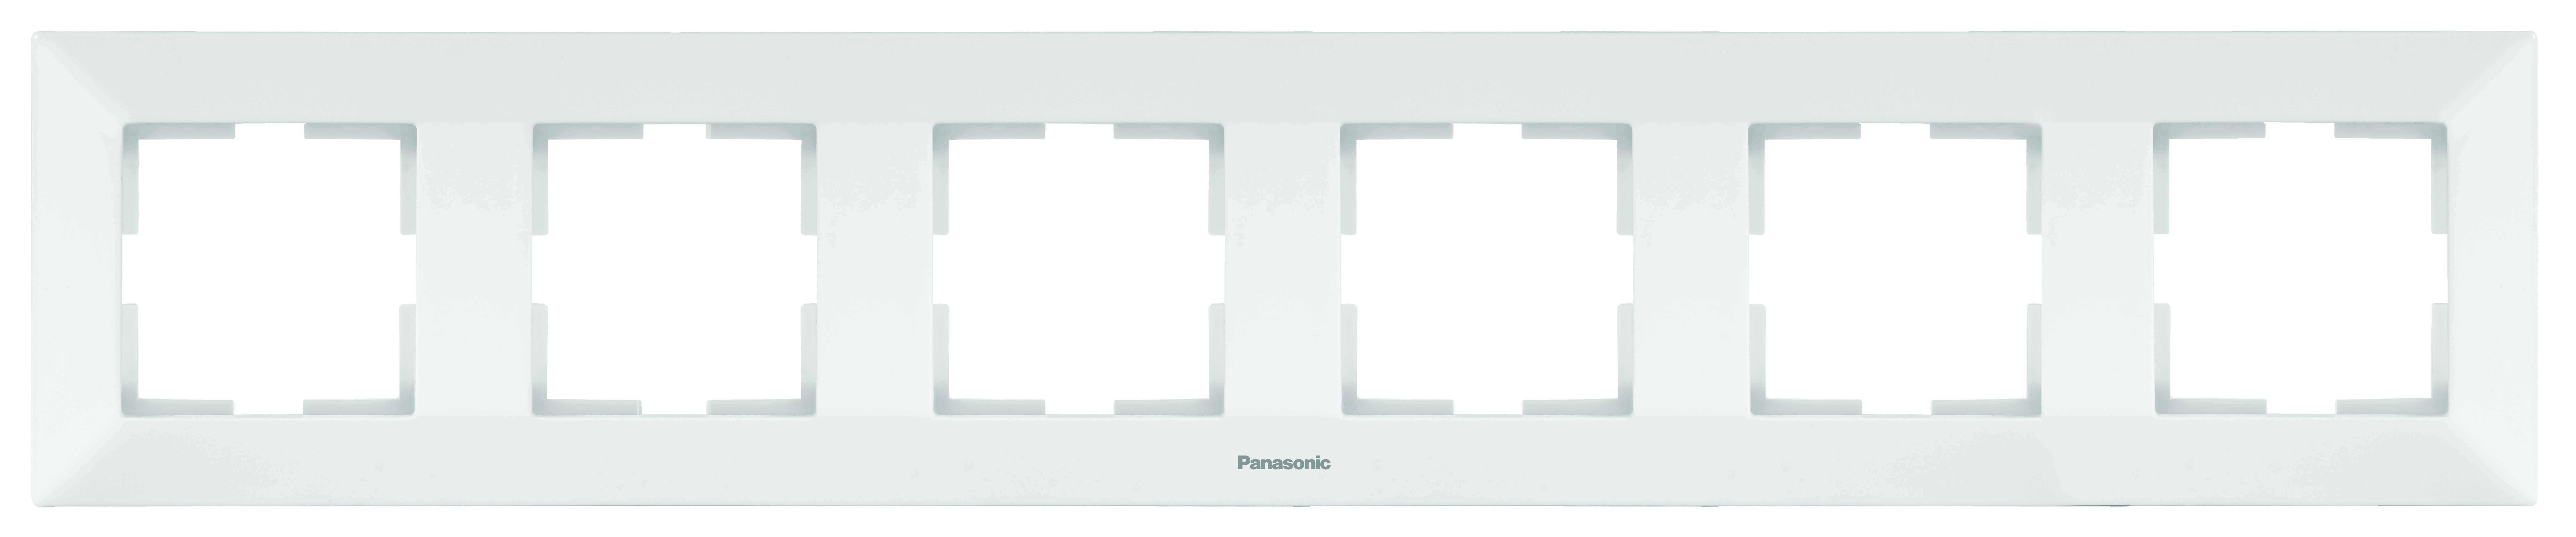 Рамка Panasonic Wktf0804-2bg-res arkedia